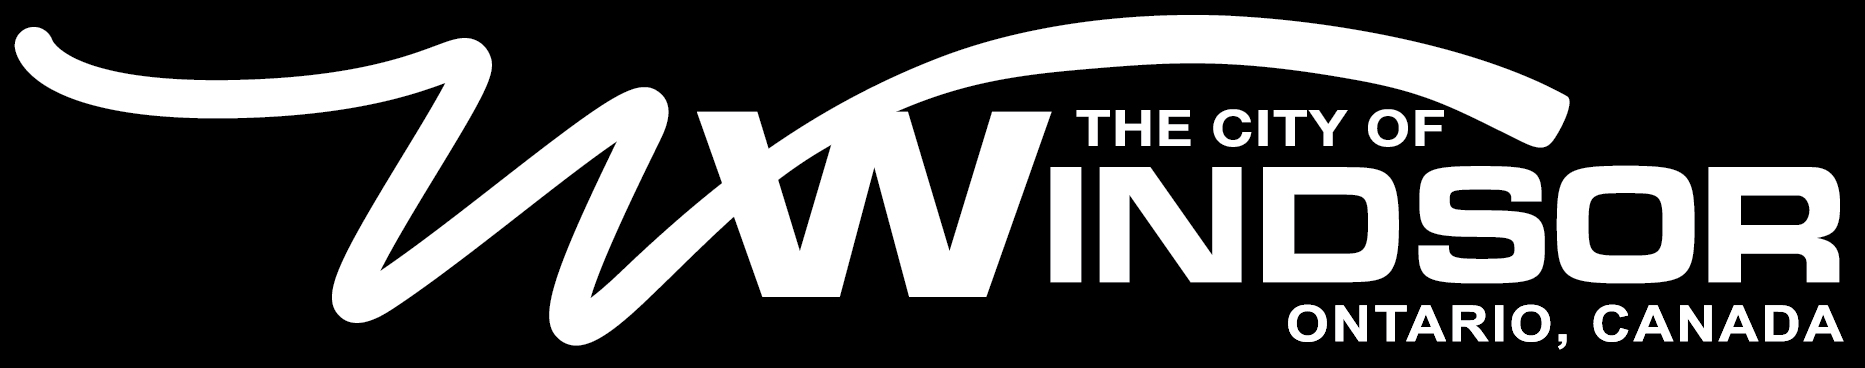 city of windsor bursary application guidelines form 2017